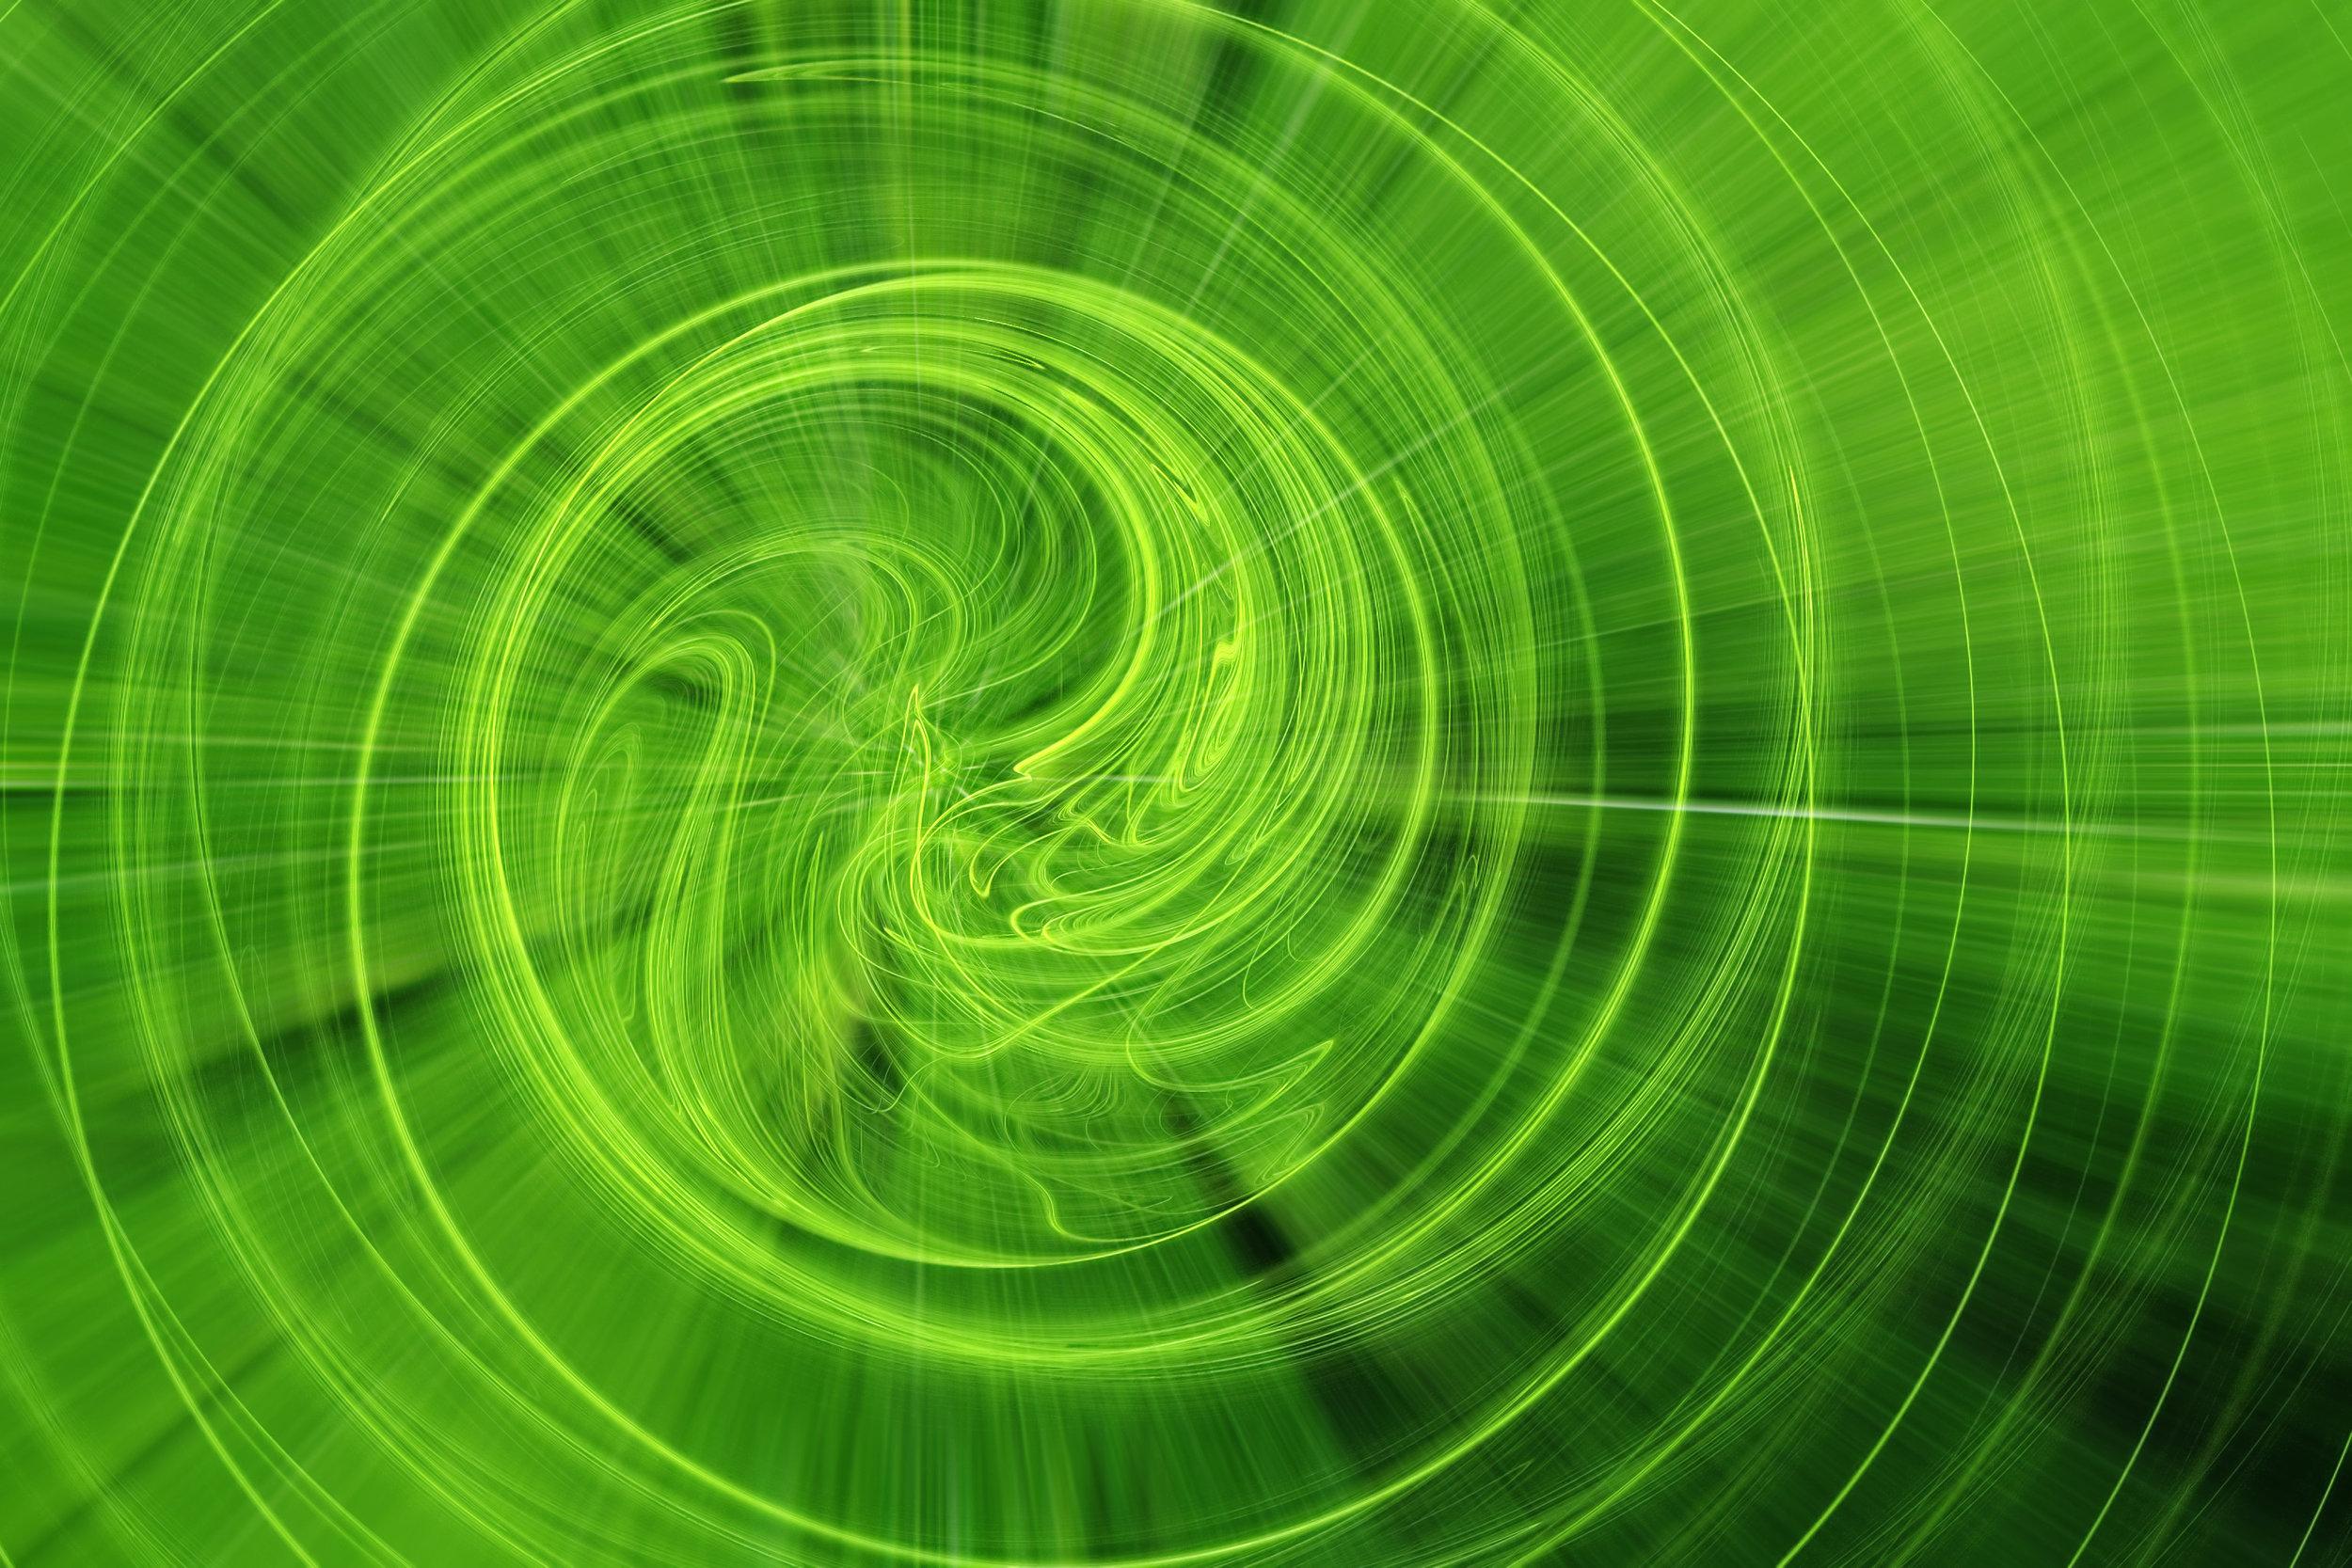 green-lines-fractal-background_GknajQOu.jpg